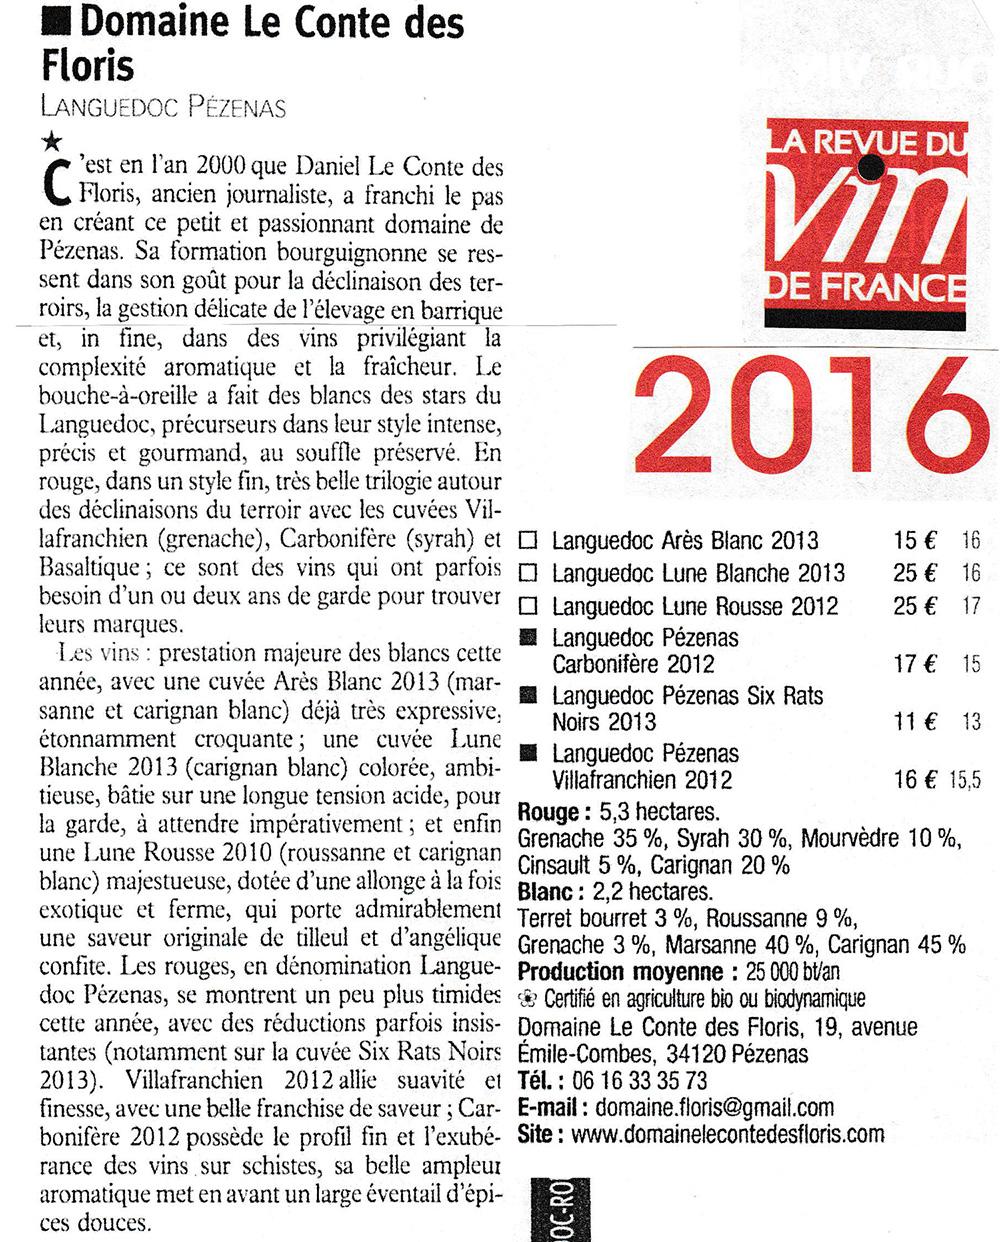 rvf-guide-2016